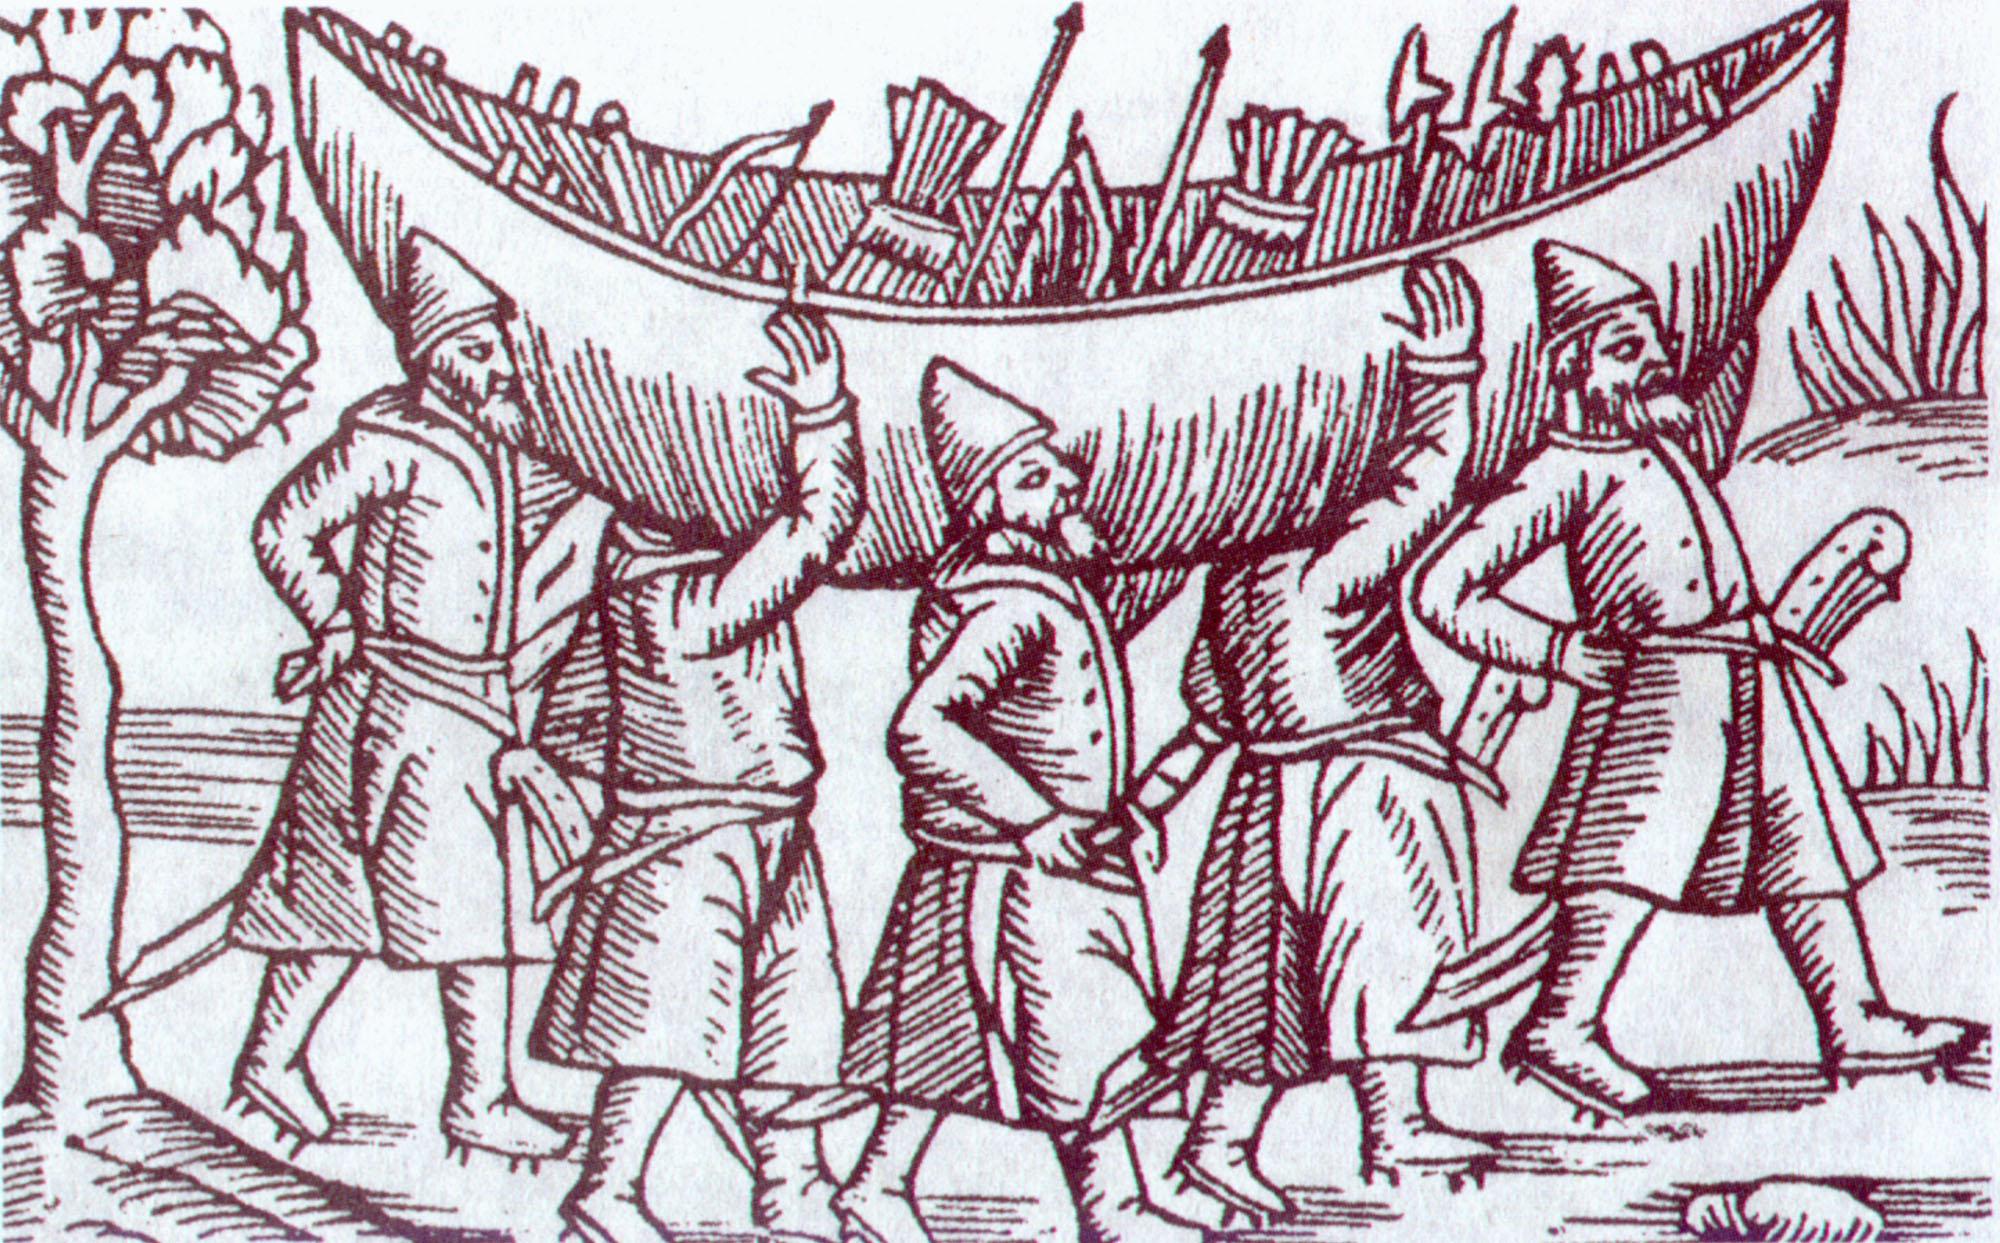 Перенос лодки через волок. С гравюры XVI века.